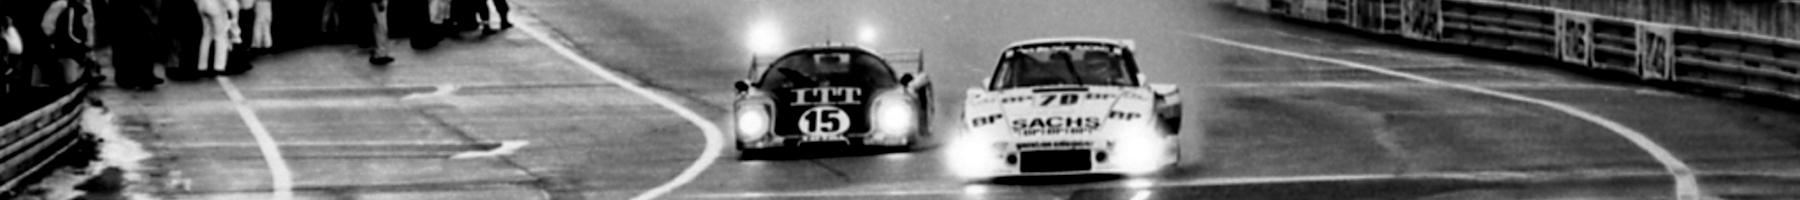 racing slice